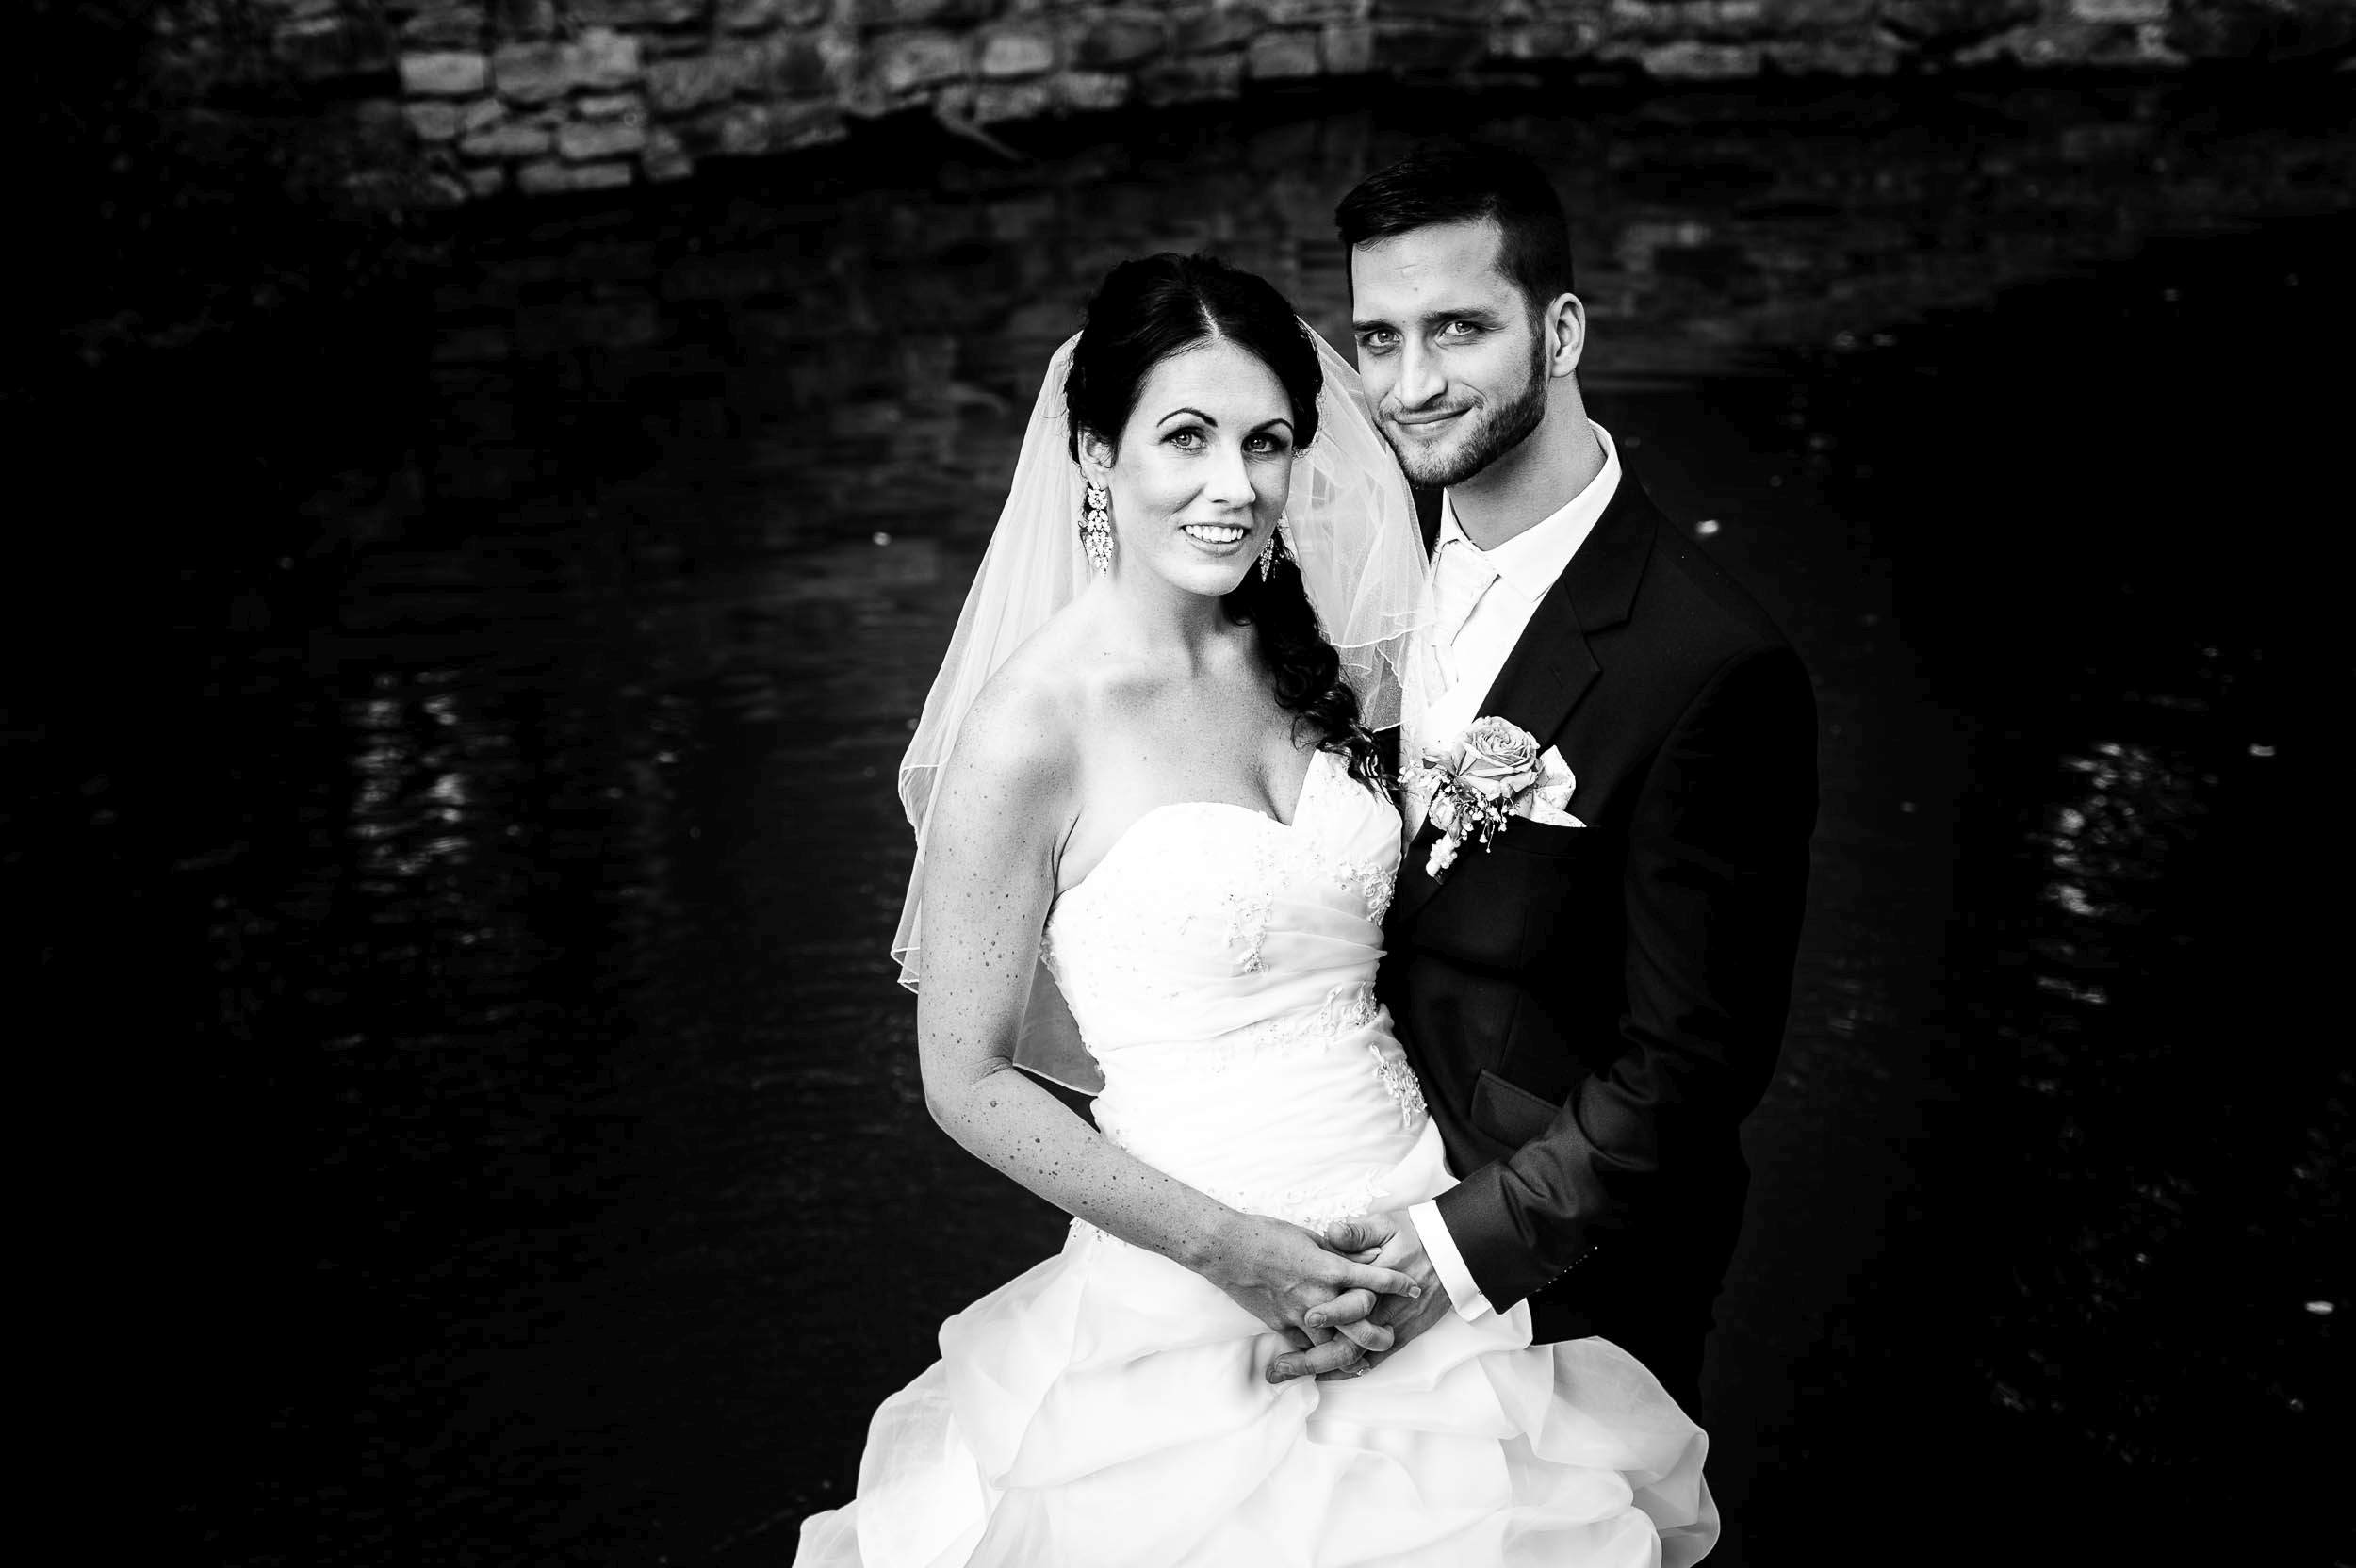 Svatební fotografie Rousínov, Brno